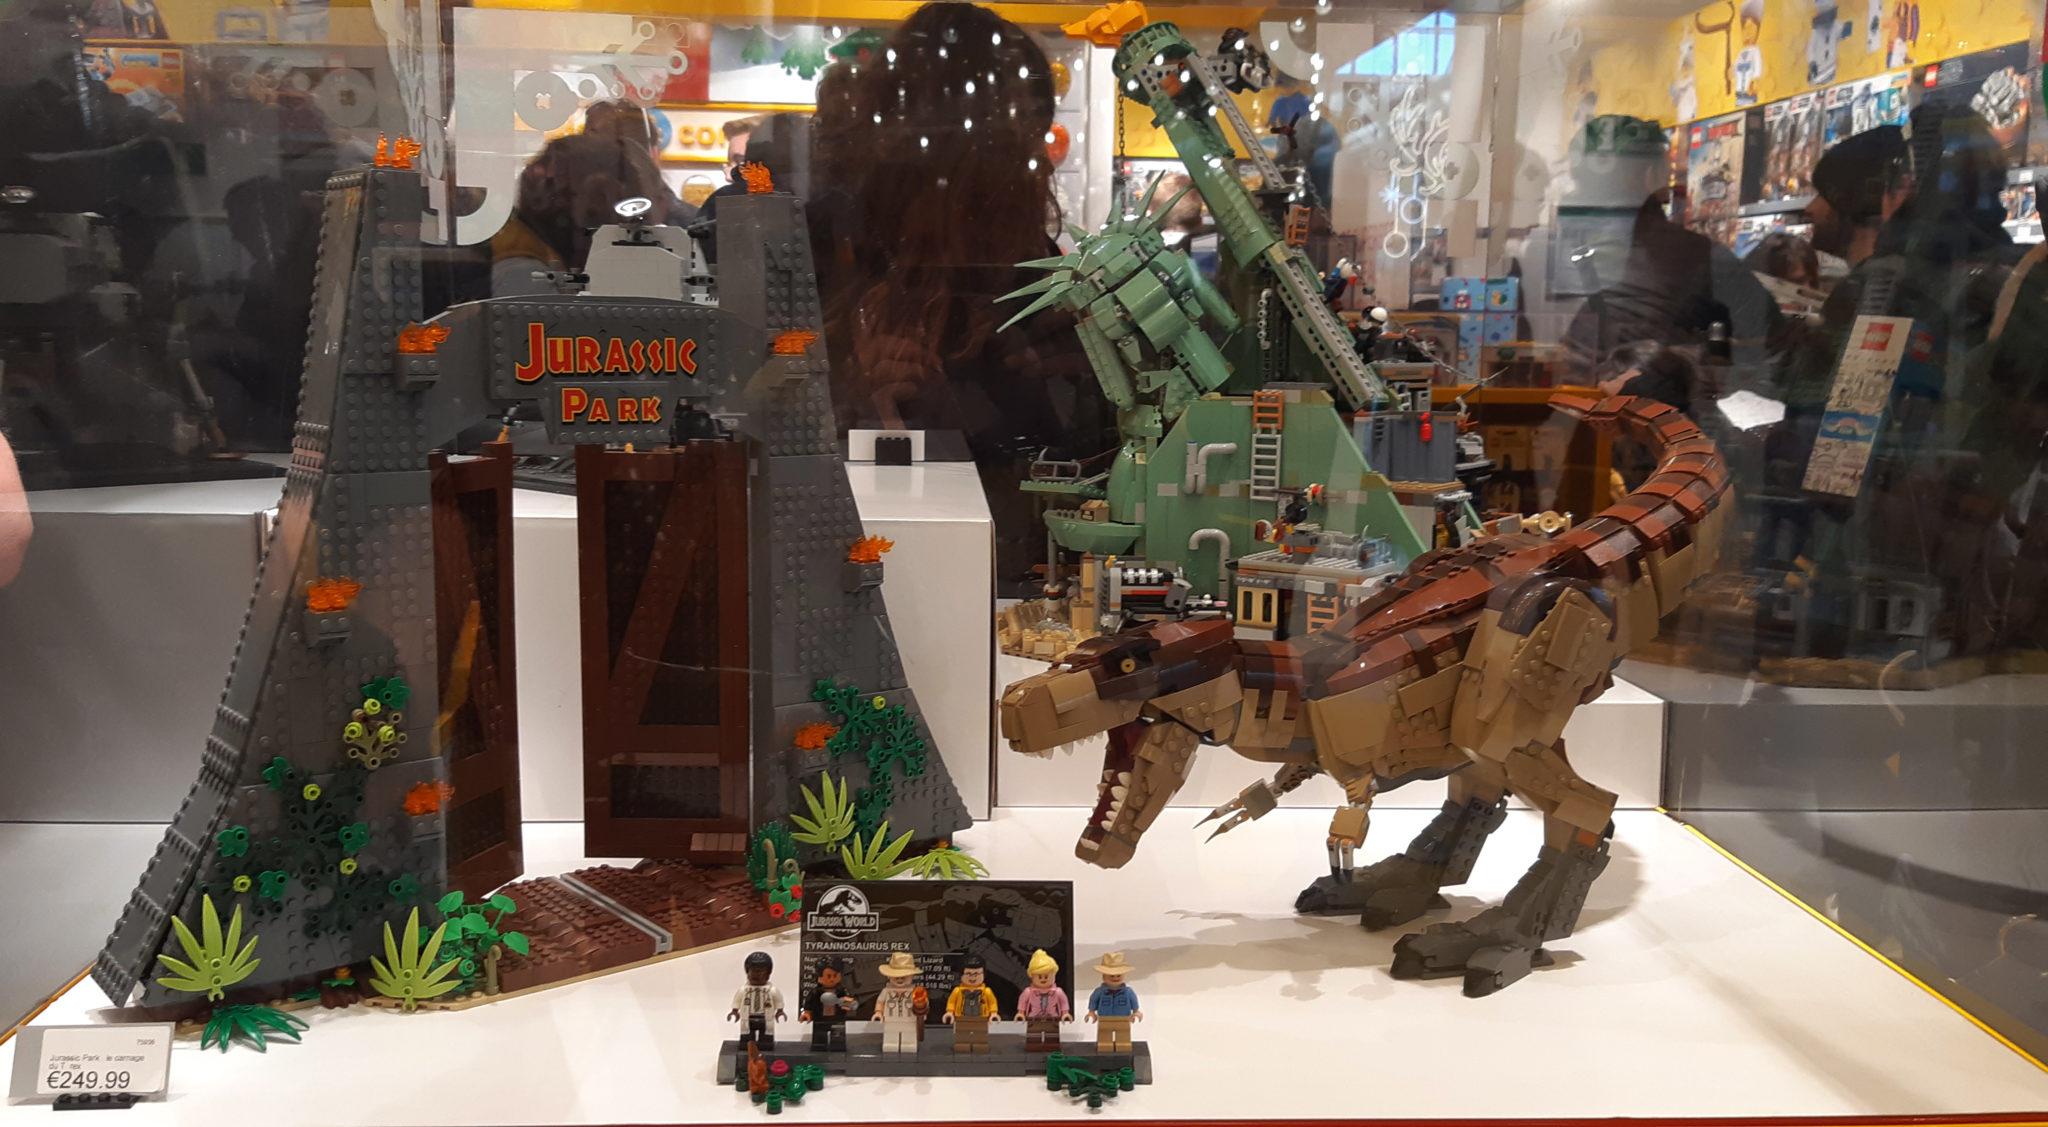 Lego store Marseille, jurassic park